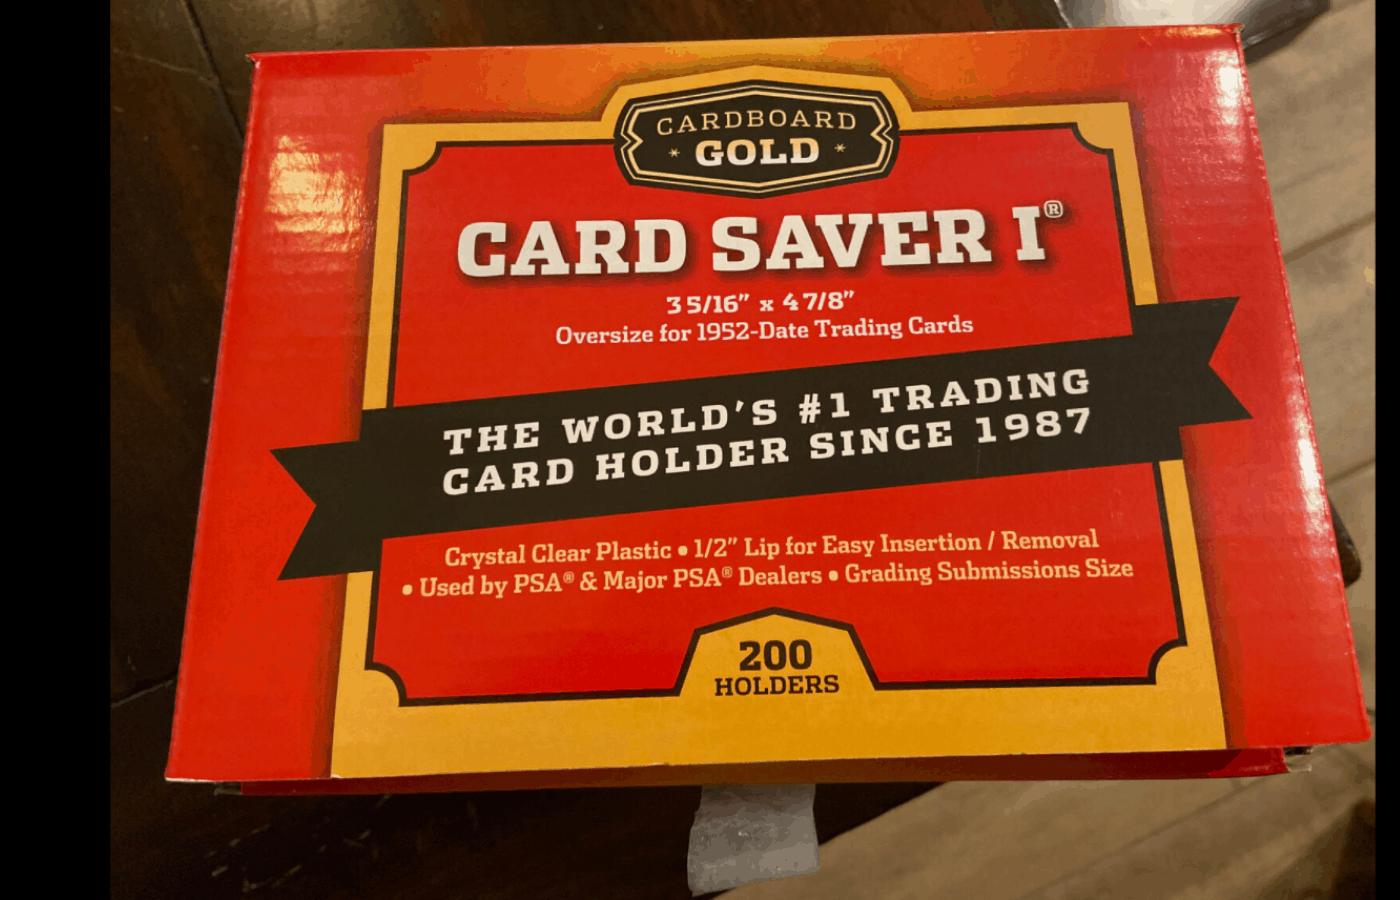 do card savers bend or warp cards